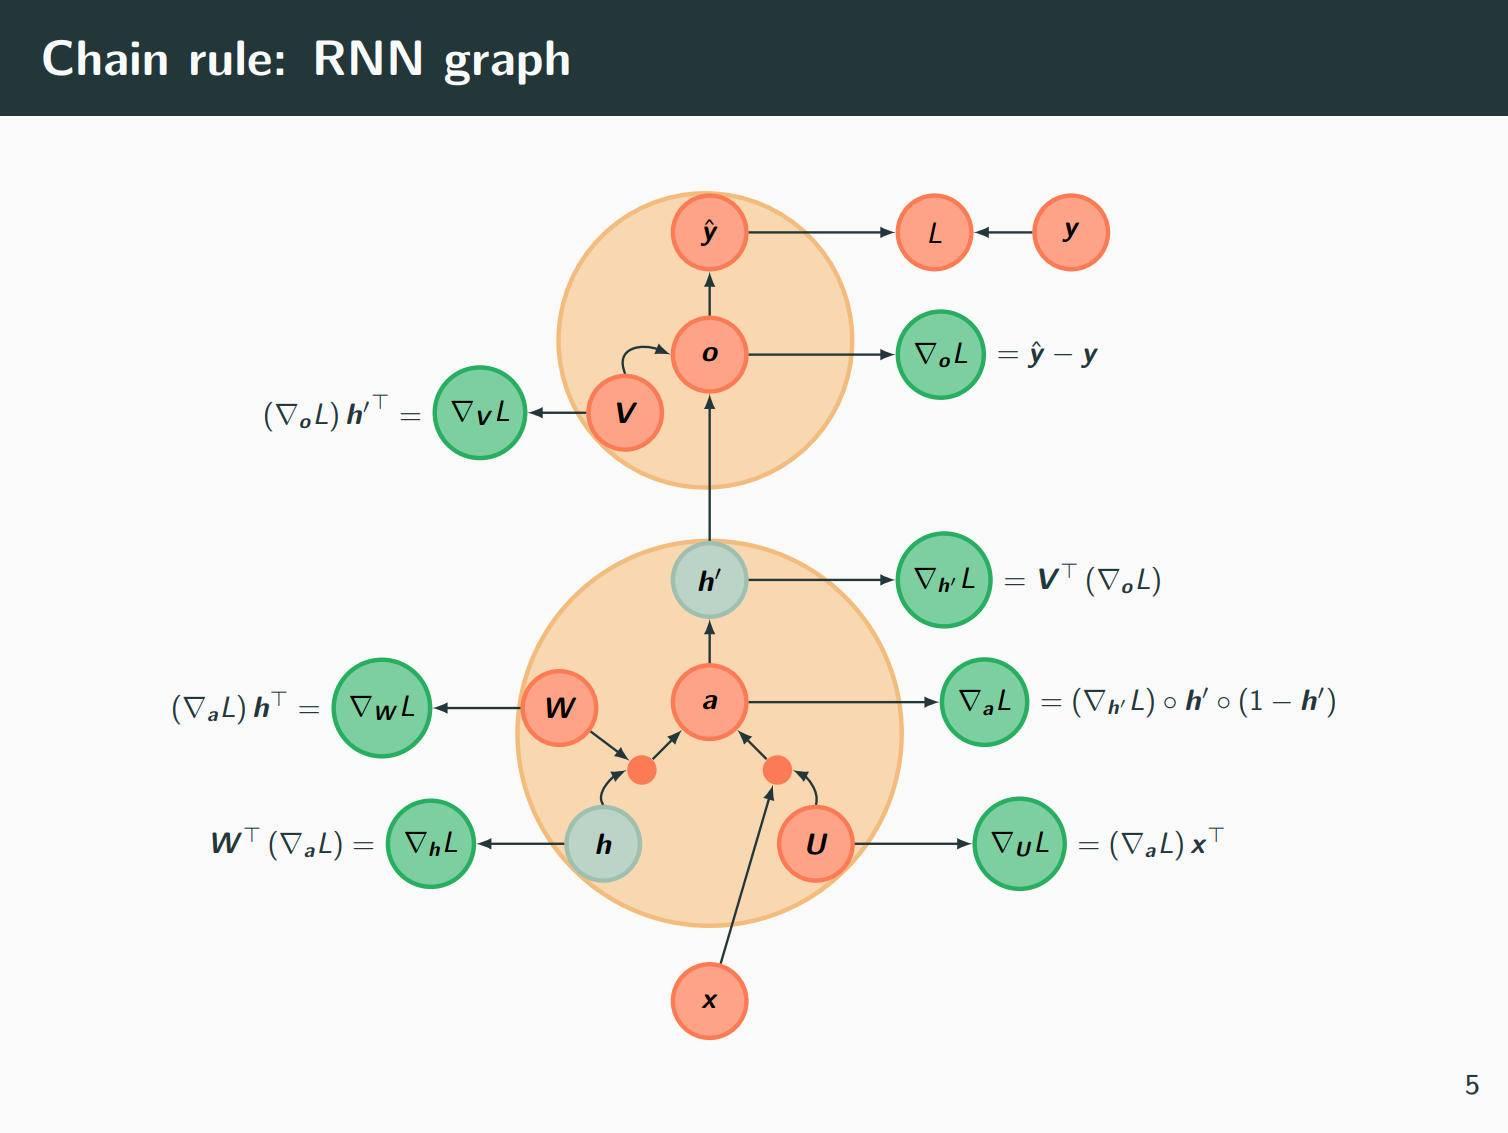 TikZ 绘制漂亮的循环神经网络(RNN)的 beamer 排版